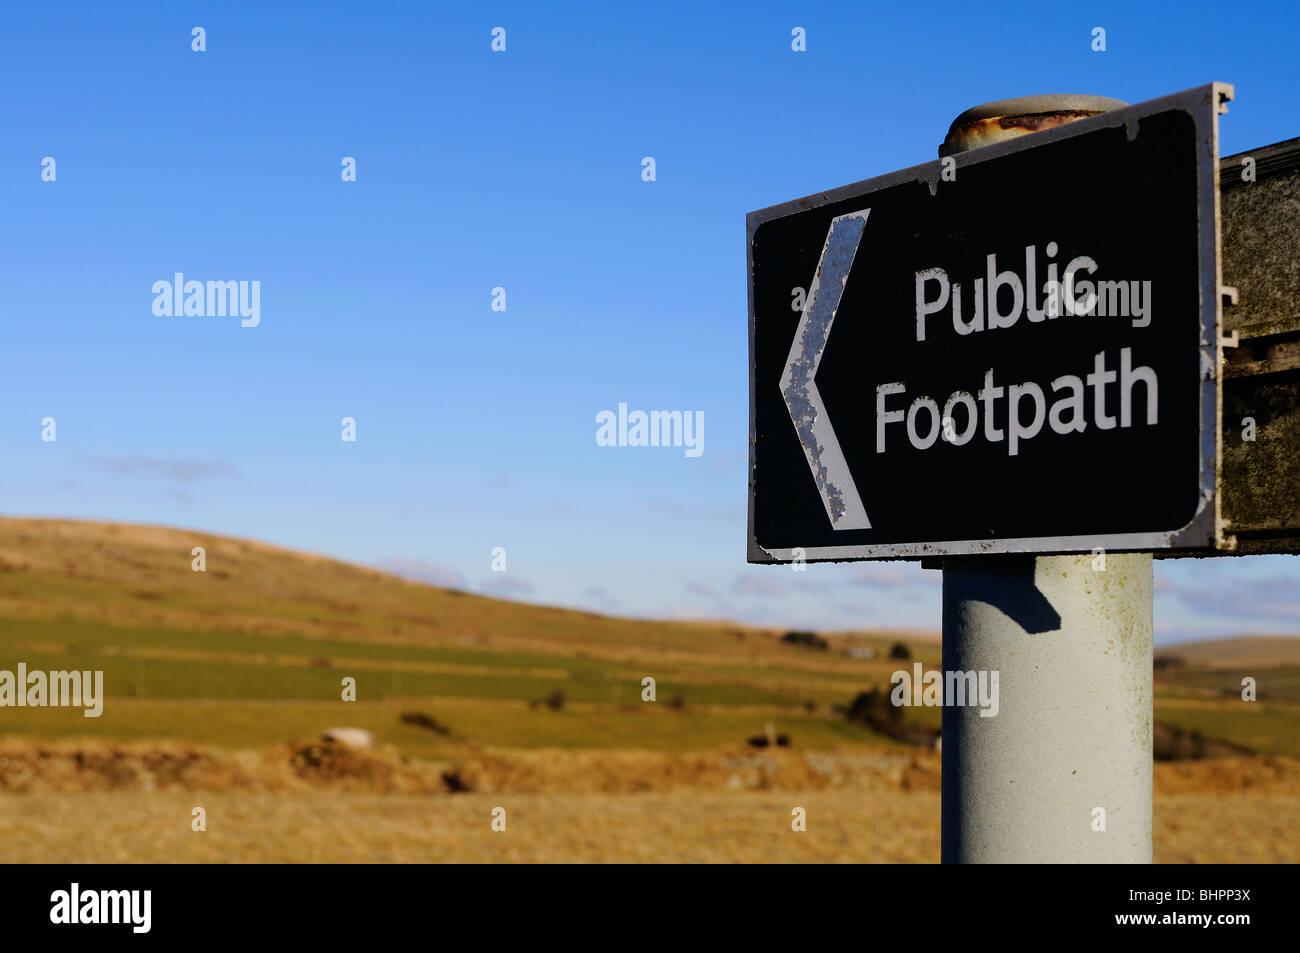 a public footpath sign on dartmoor in devon, uk - Stock Image